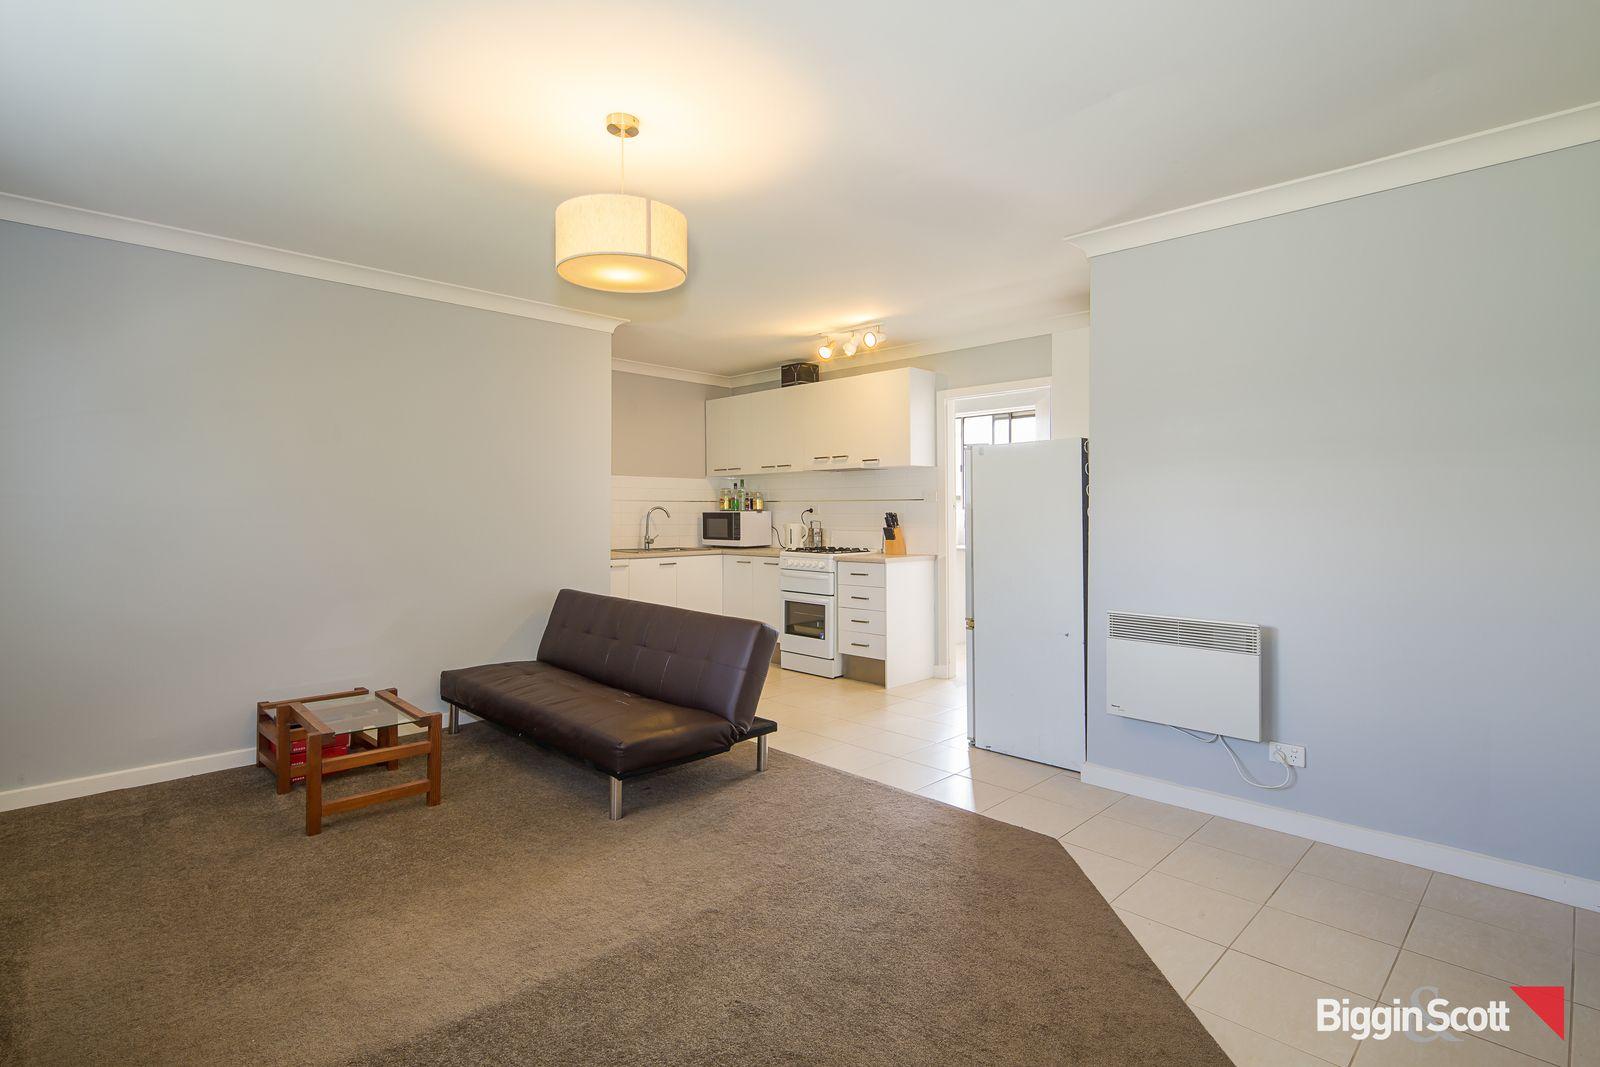 7/28 Gent Street, Ballarat East VIC 3350, Image 1